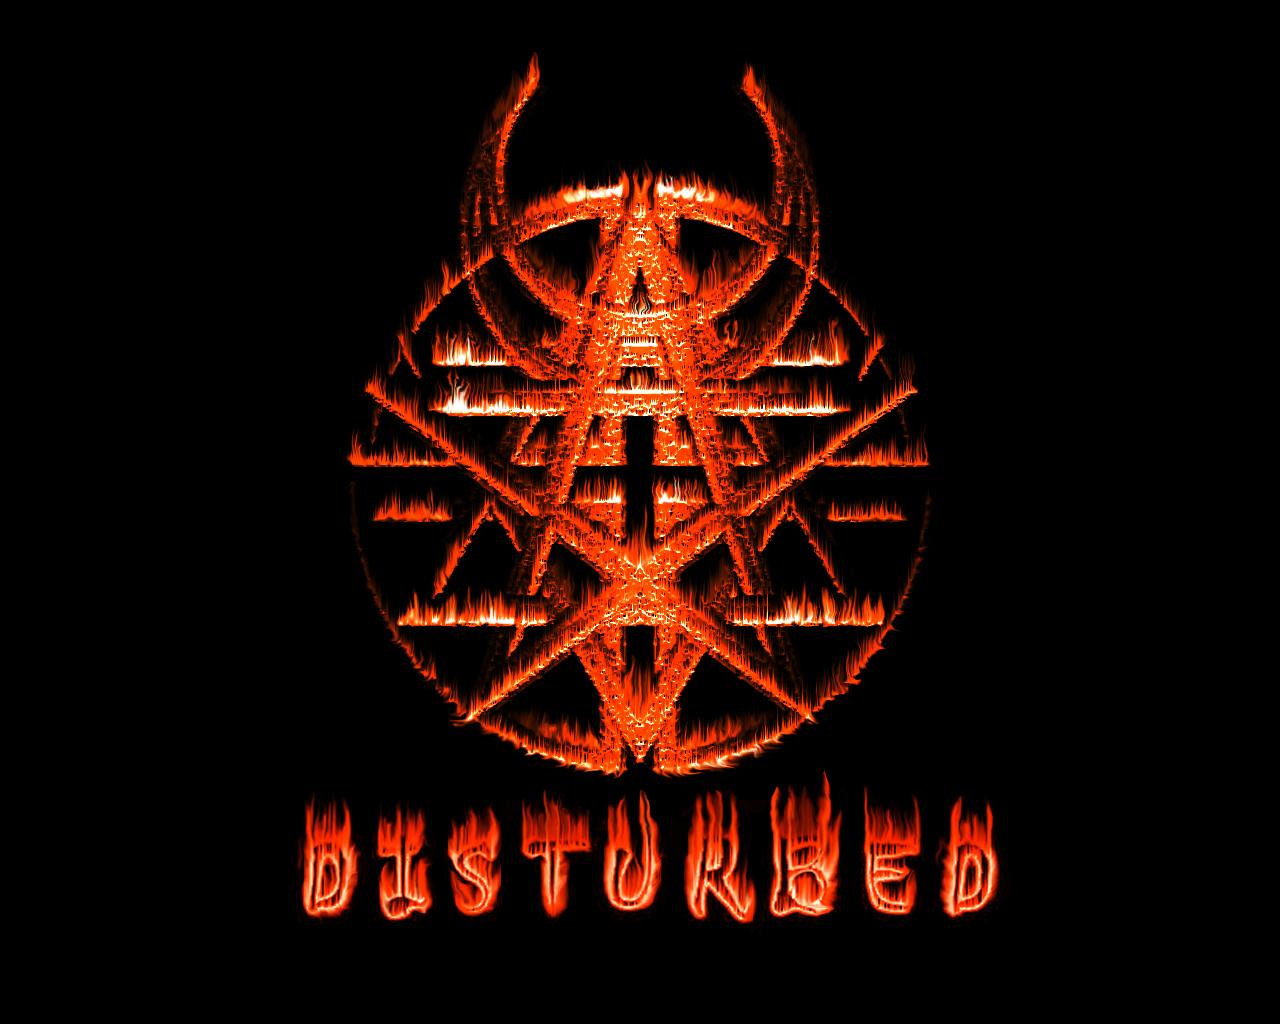 Disturbed Logos